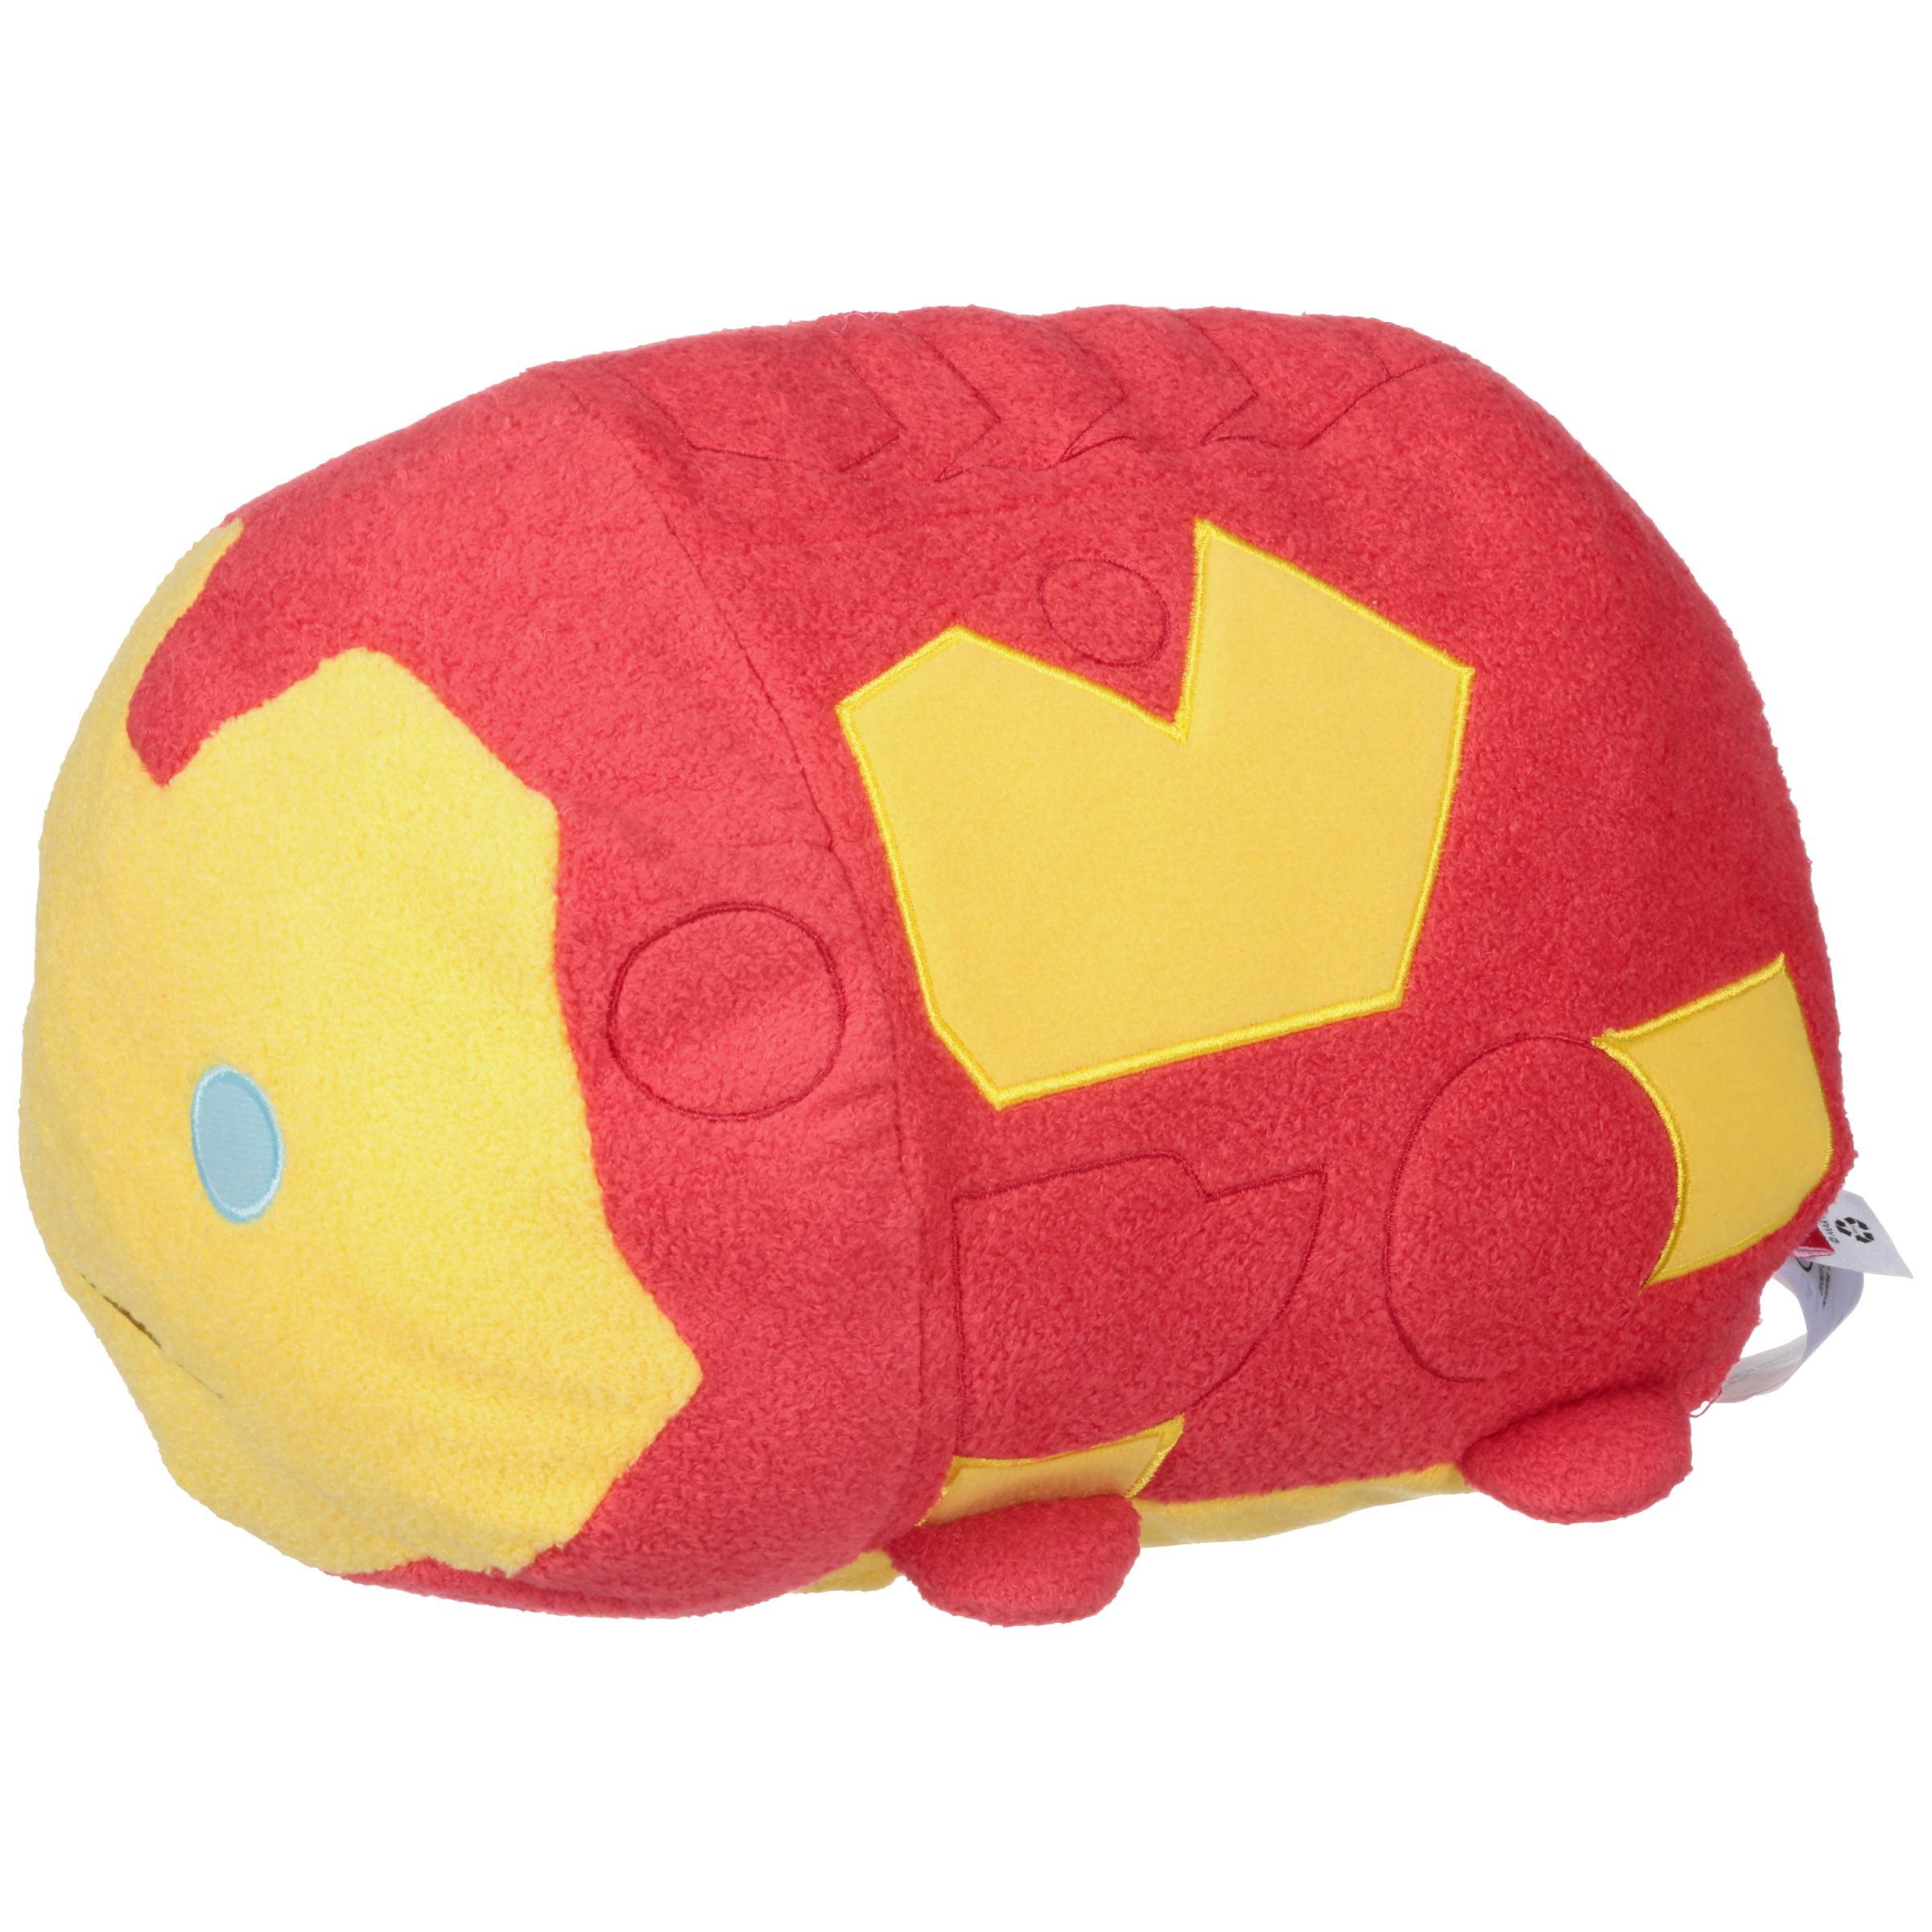 "Disney Tsum Tsum Iron Man 12"" Plush"